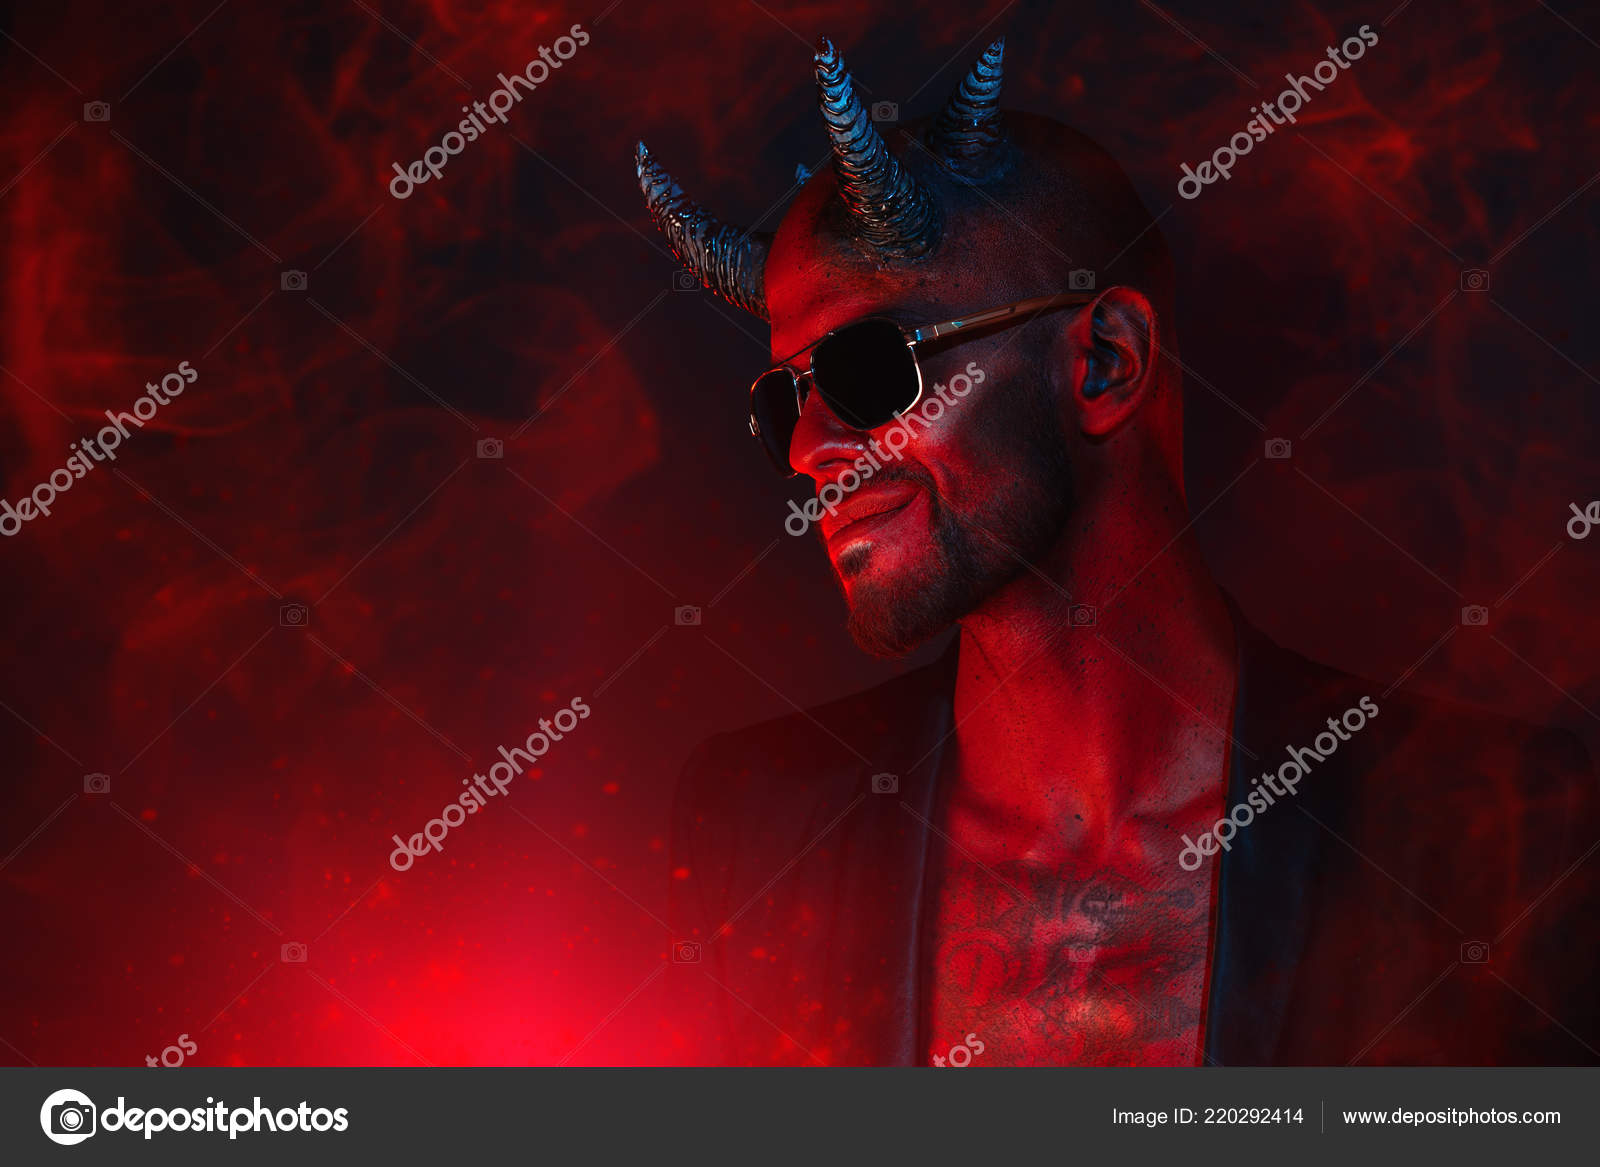 Portrait Bad Demon Sunglasses Horror Movie Nightmare Halloween